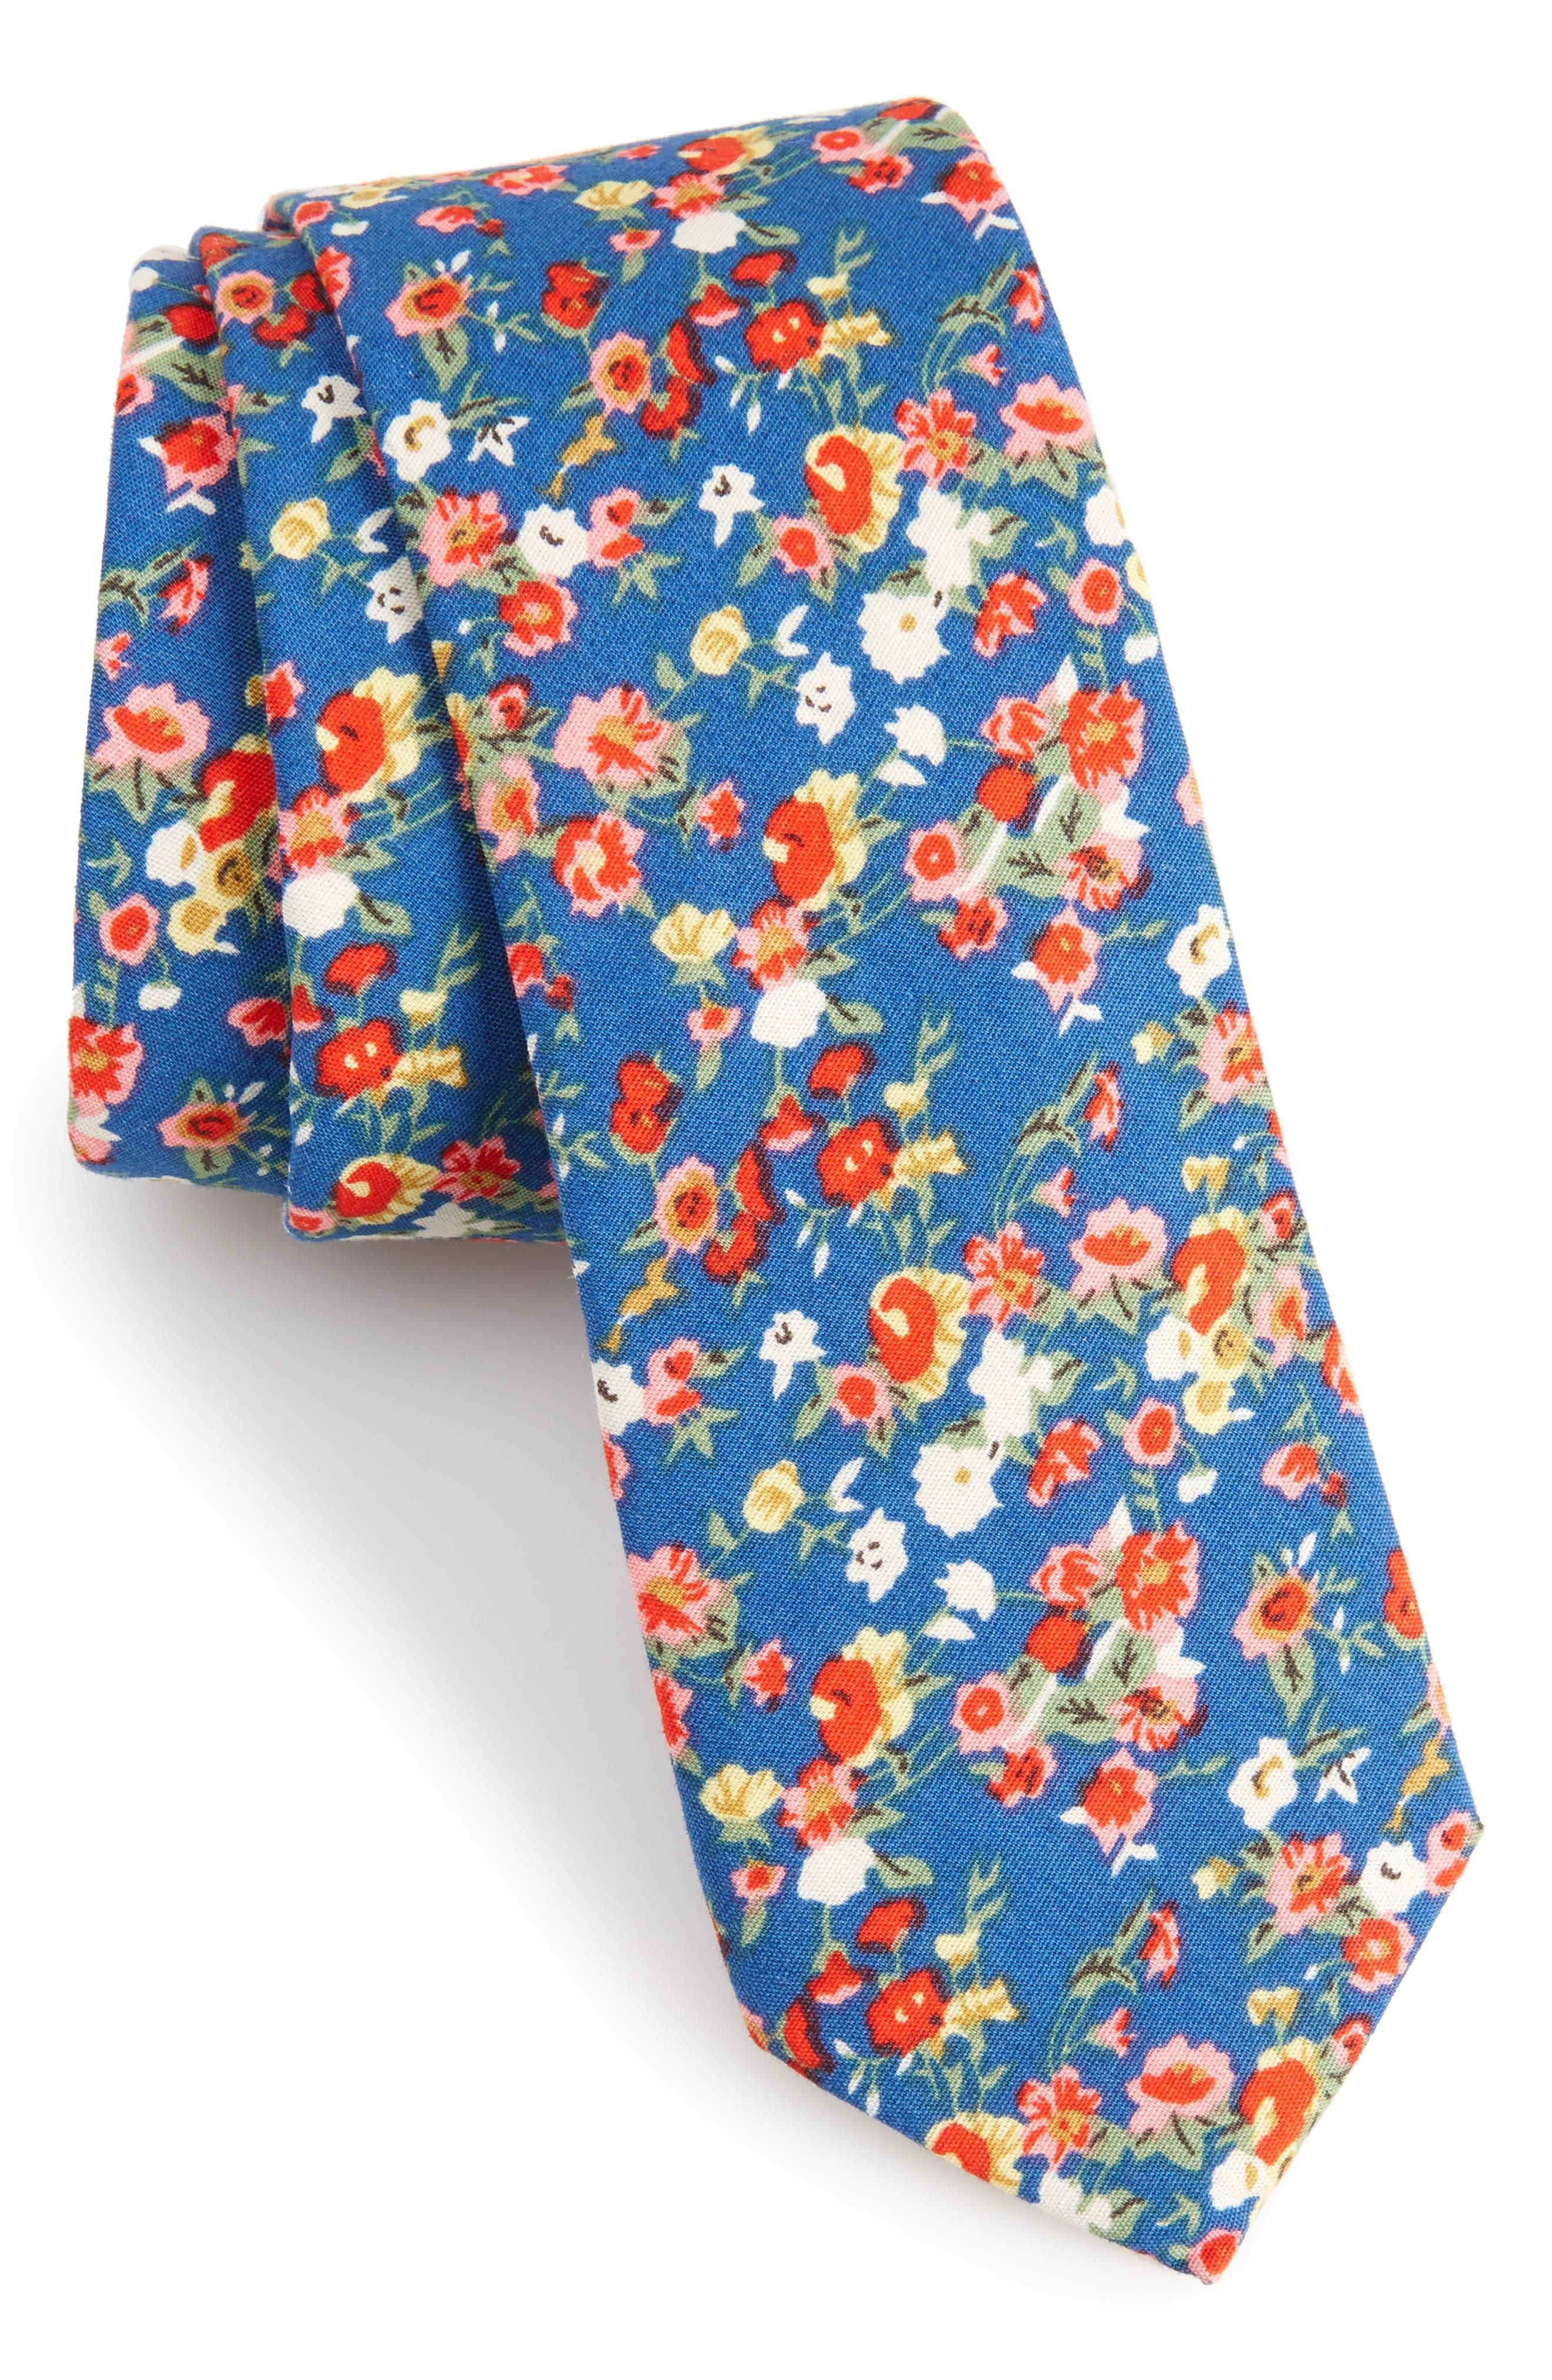 Main Image - Nordstrom Men's Shop Brayfield Floral Cotton Skinny Tie